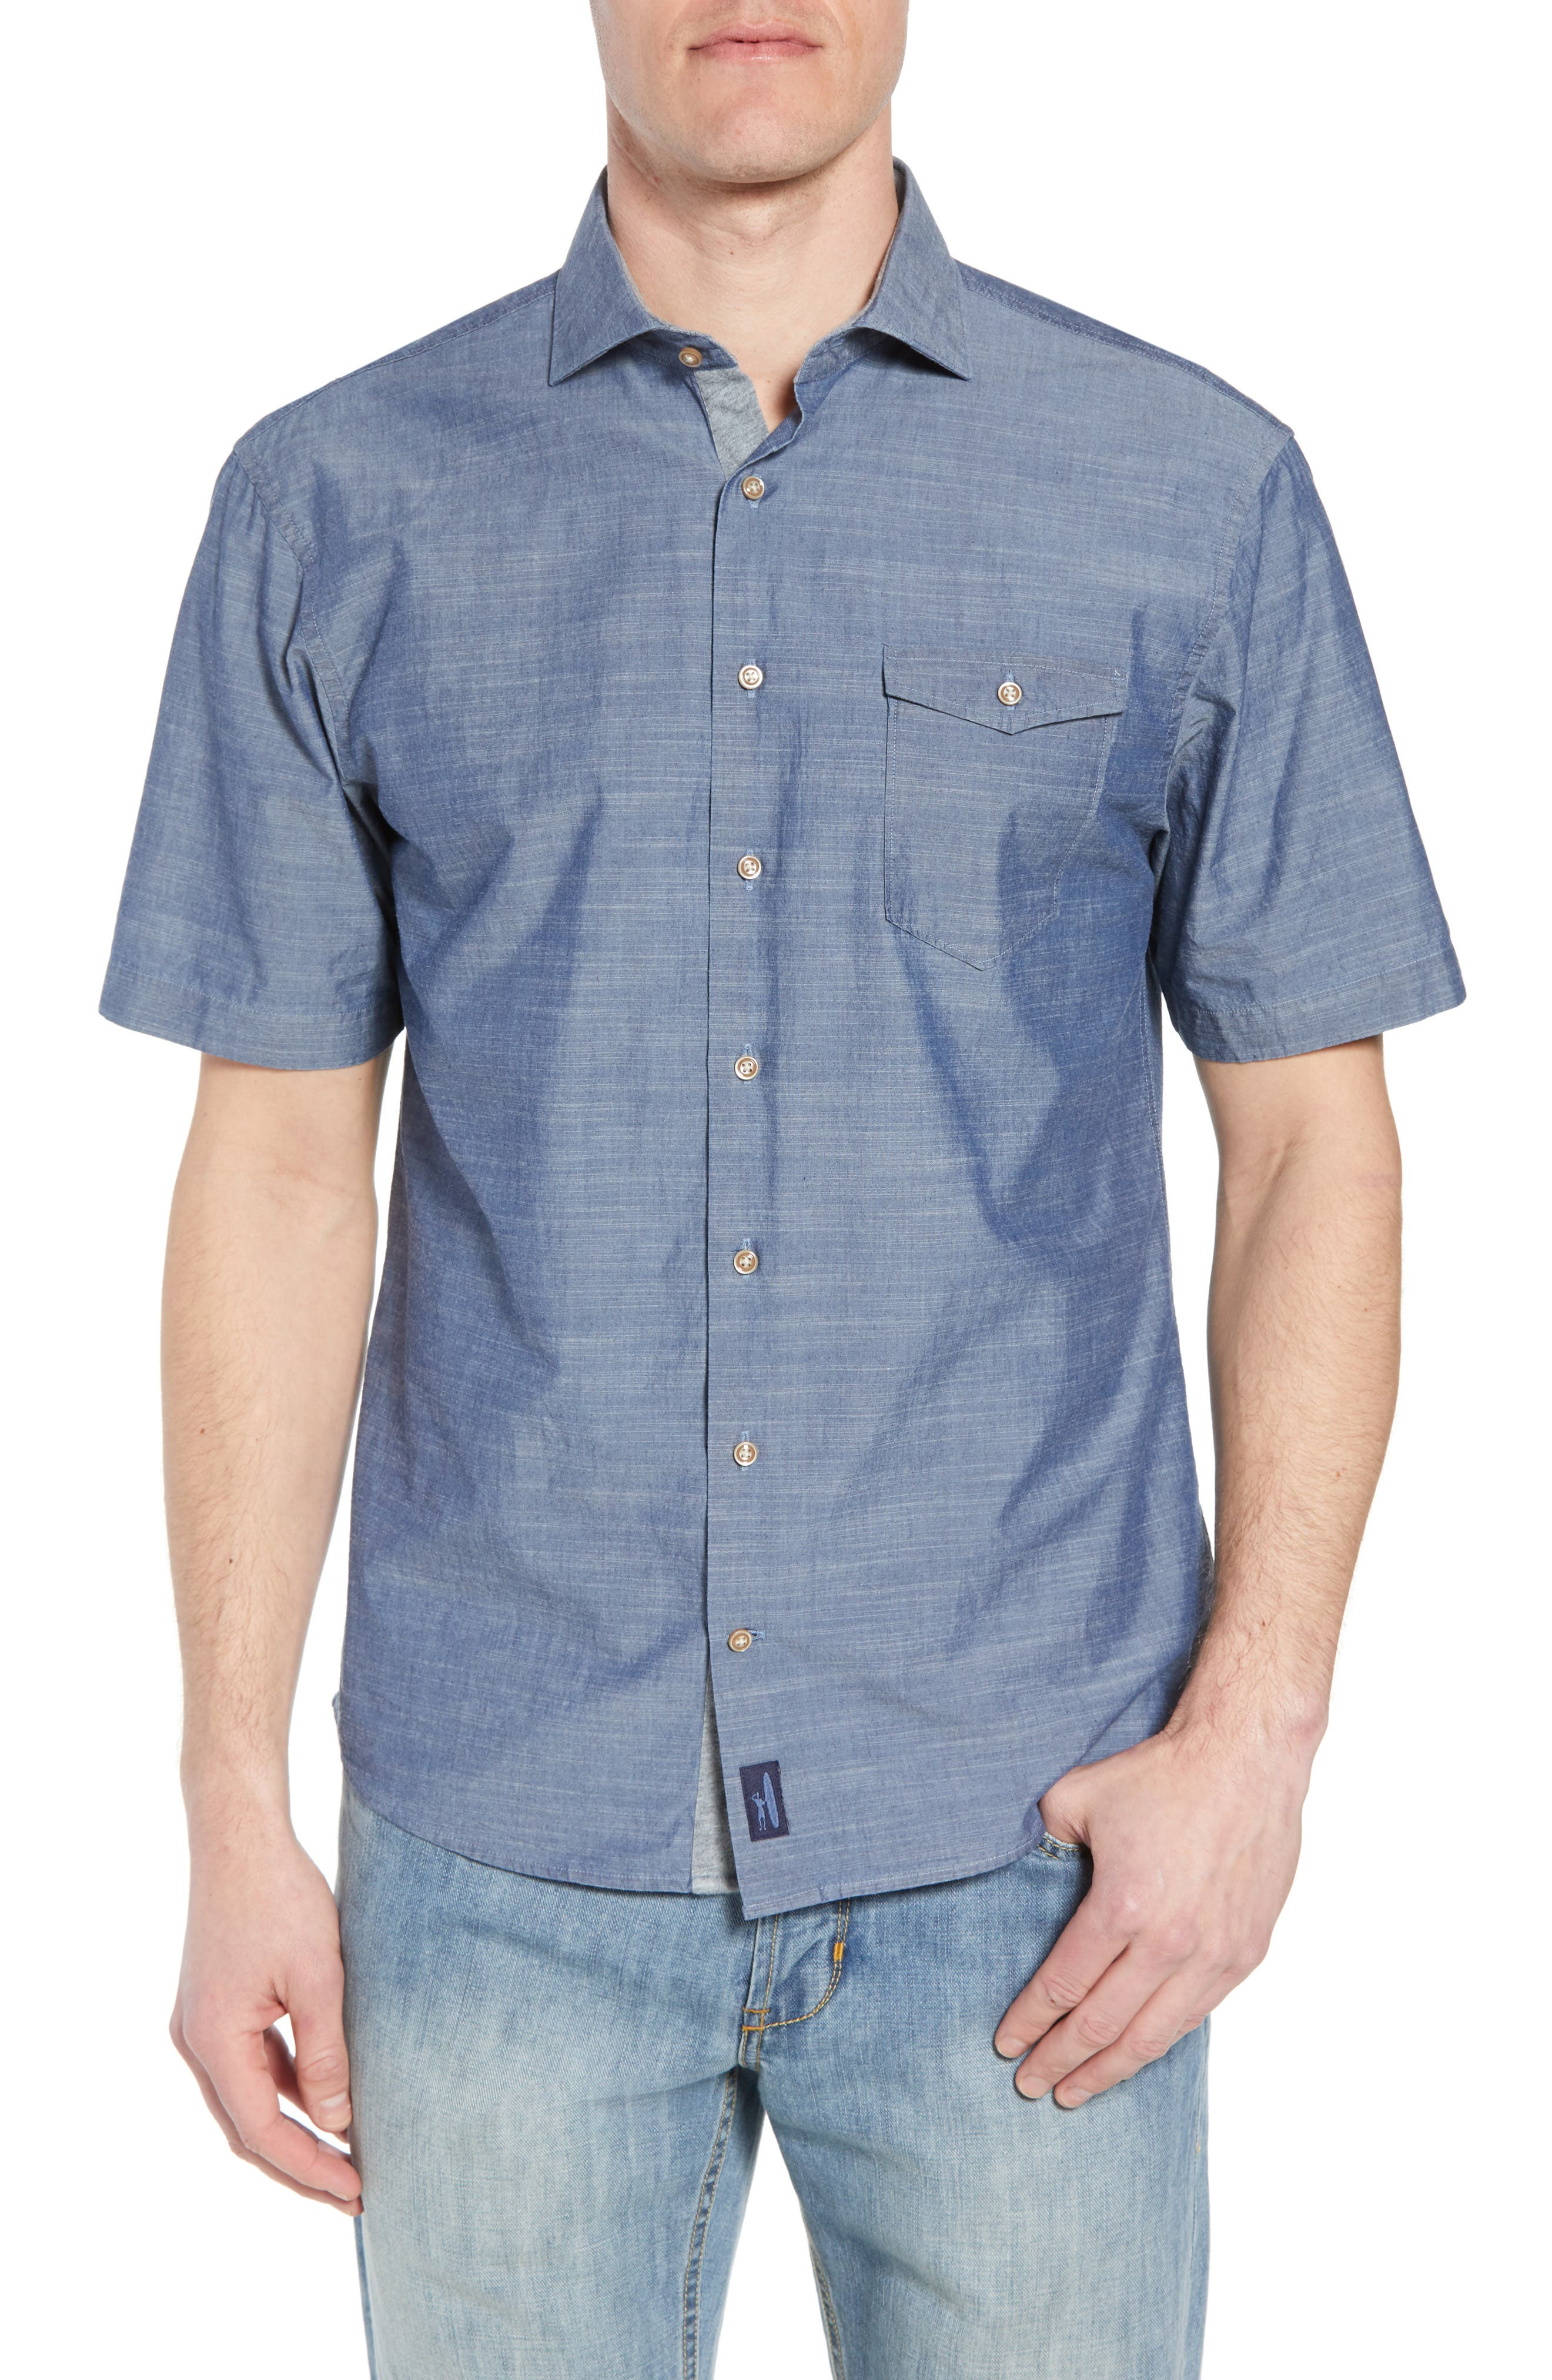 Lucas Regular Fit Chambray Sport Shirt,                             Main thumbnail 1, color,                             403